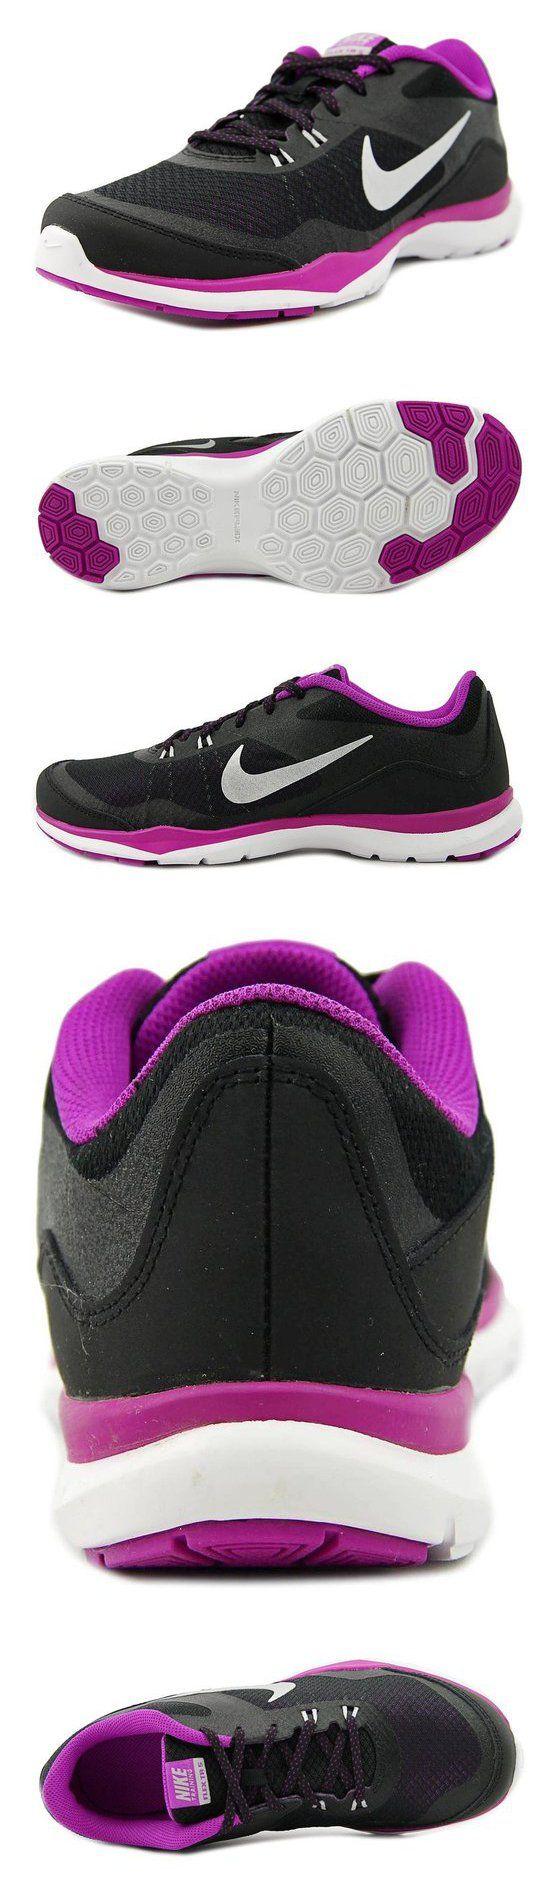 $70 - Women's Nike Flex Trainer 5 Training Shoe Black/Purple/Bright Grape/Metallic Silver Size 9 M US #shoes #nike #2010